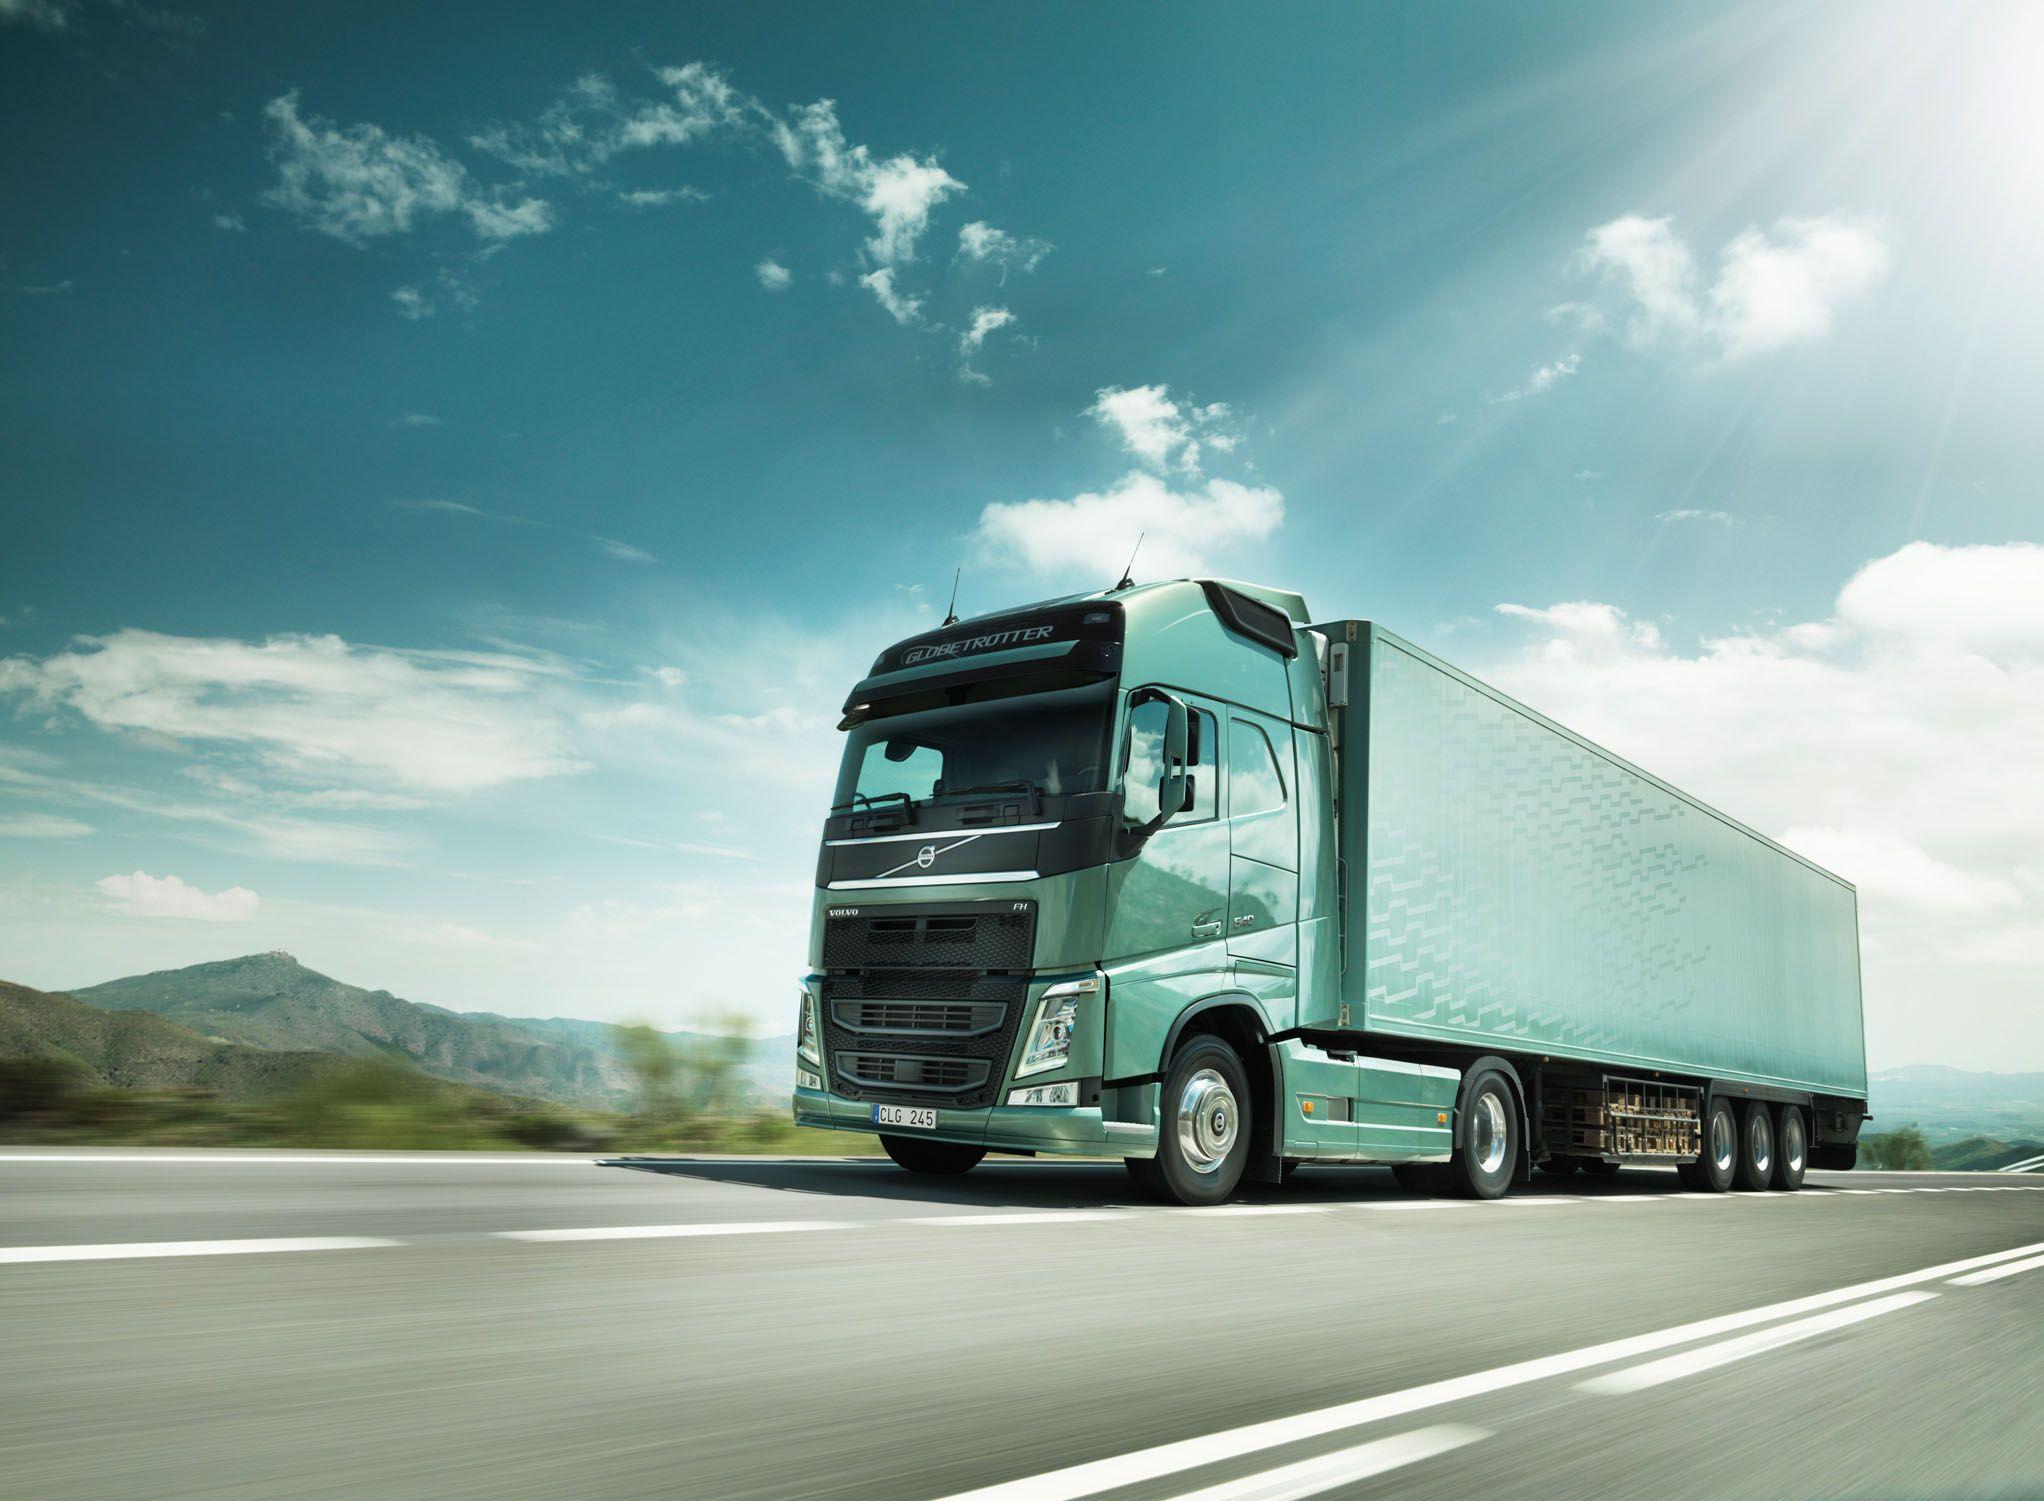 фото красивого грузового вольво эта